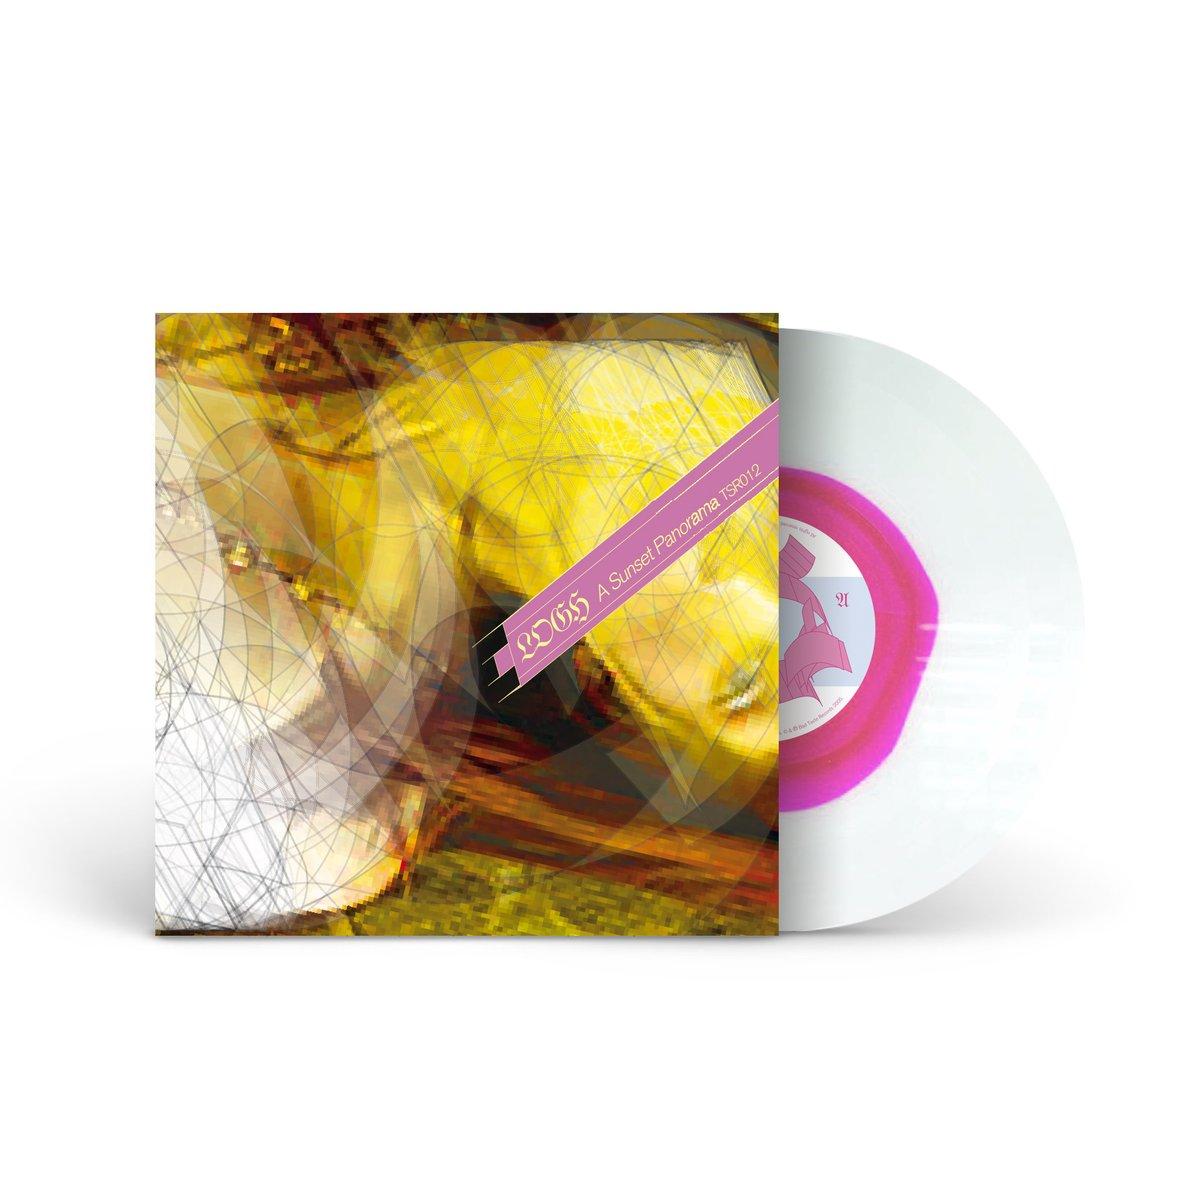 Image of Logh - A Sunset Panorama LP